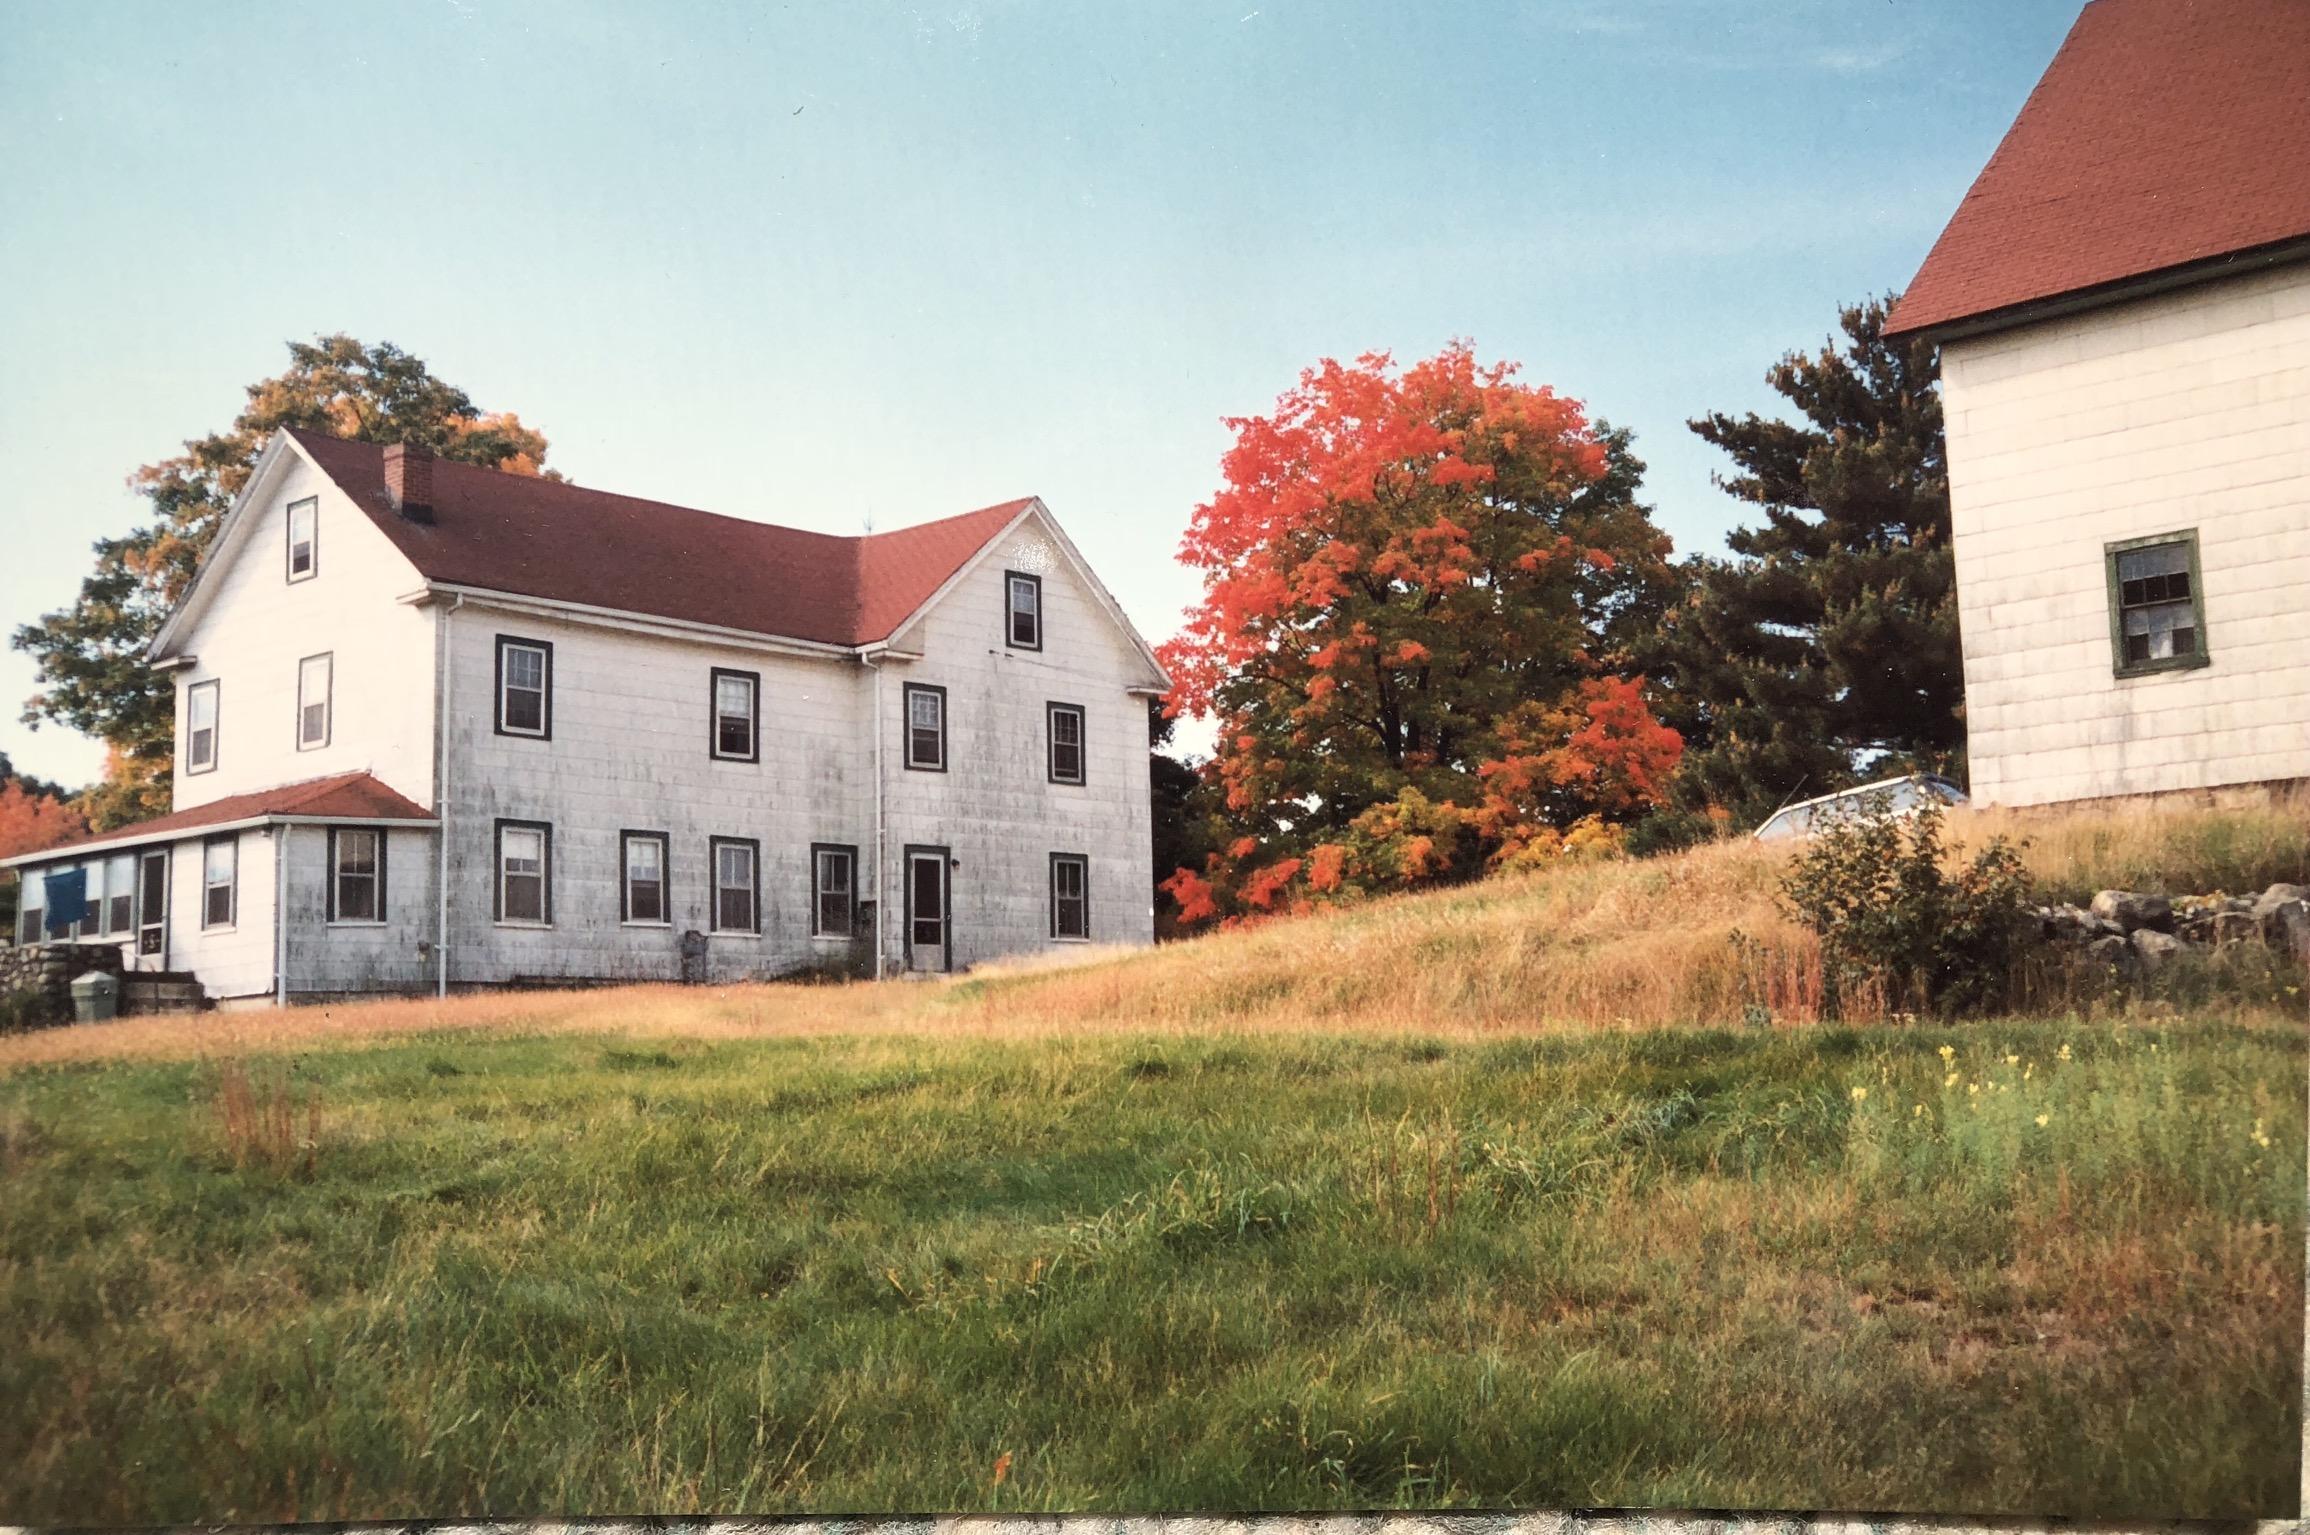 Seminatore household, 82 Bedford Street, Burlington, MA